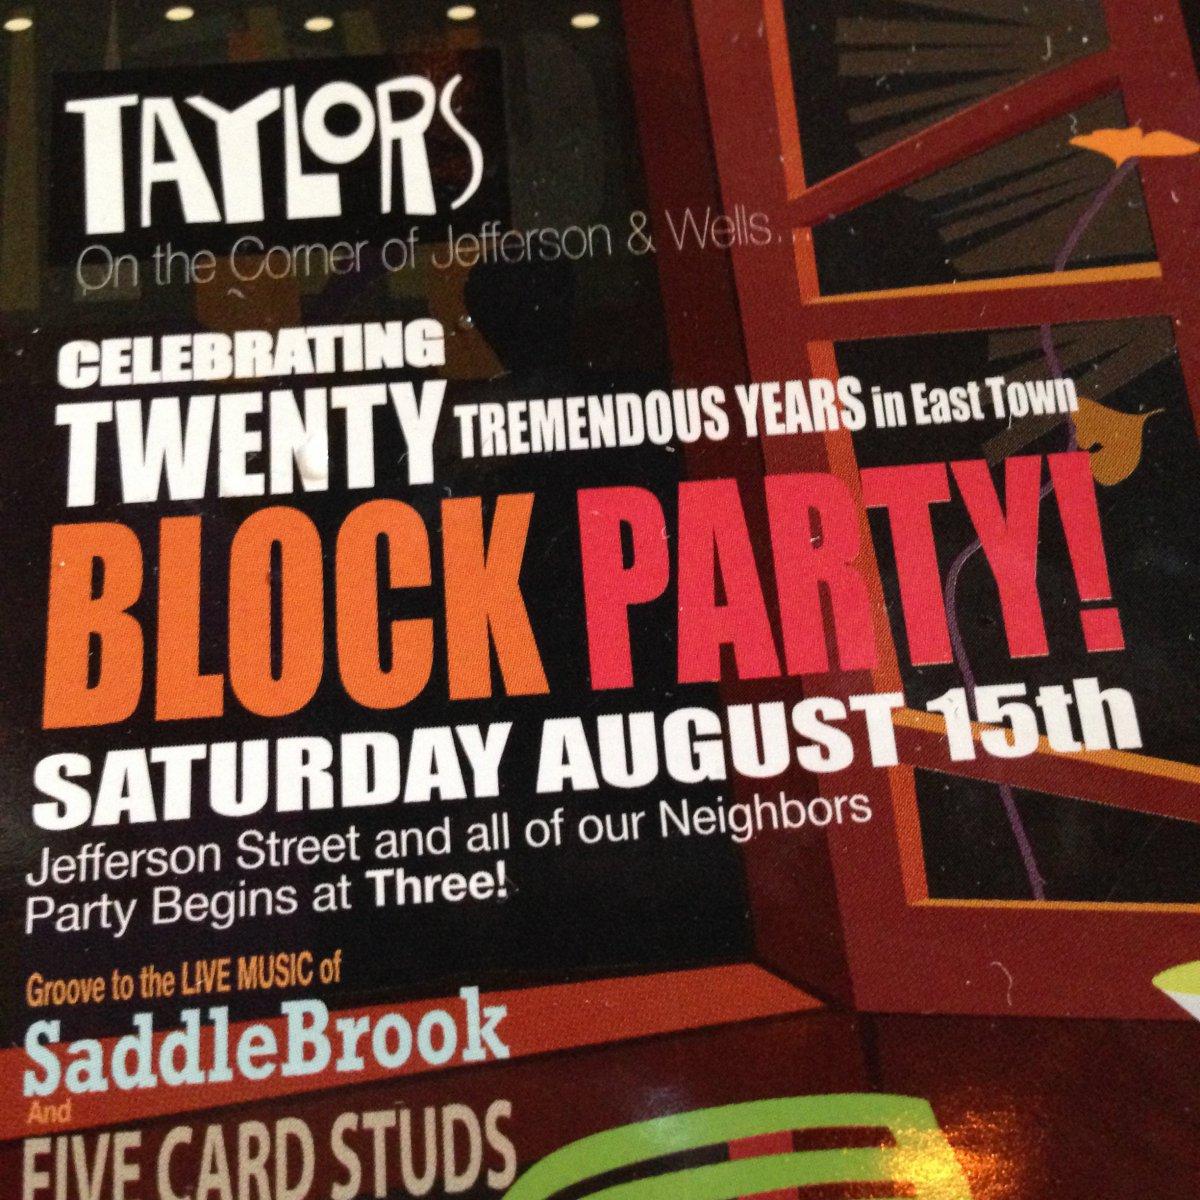 Celebrating twenty tremendous years in East Town